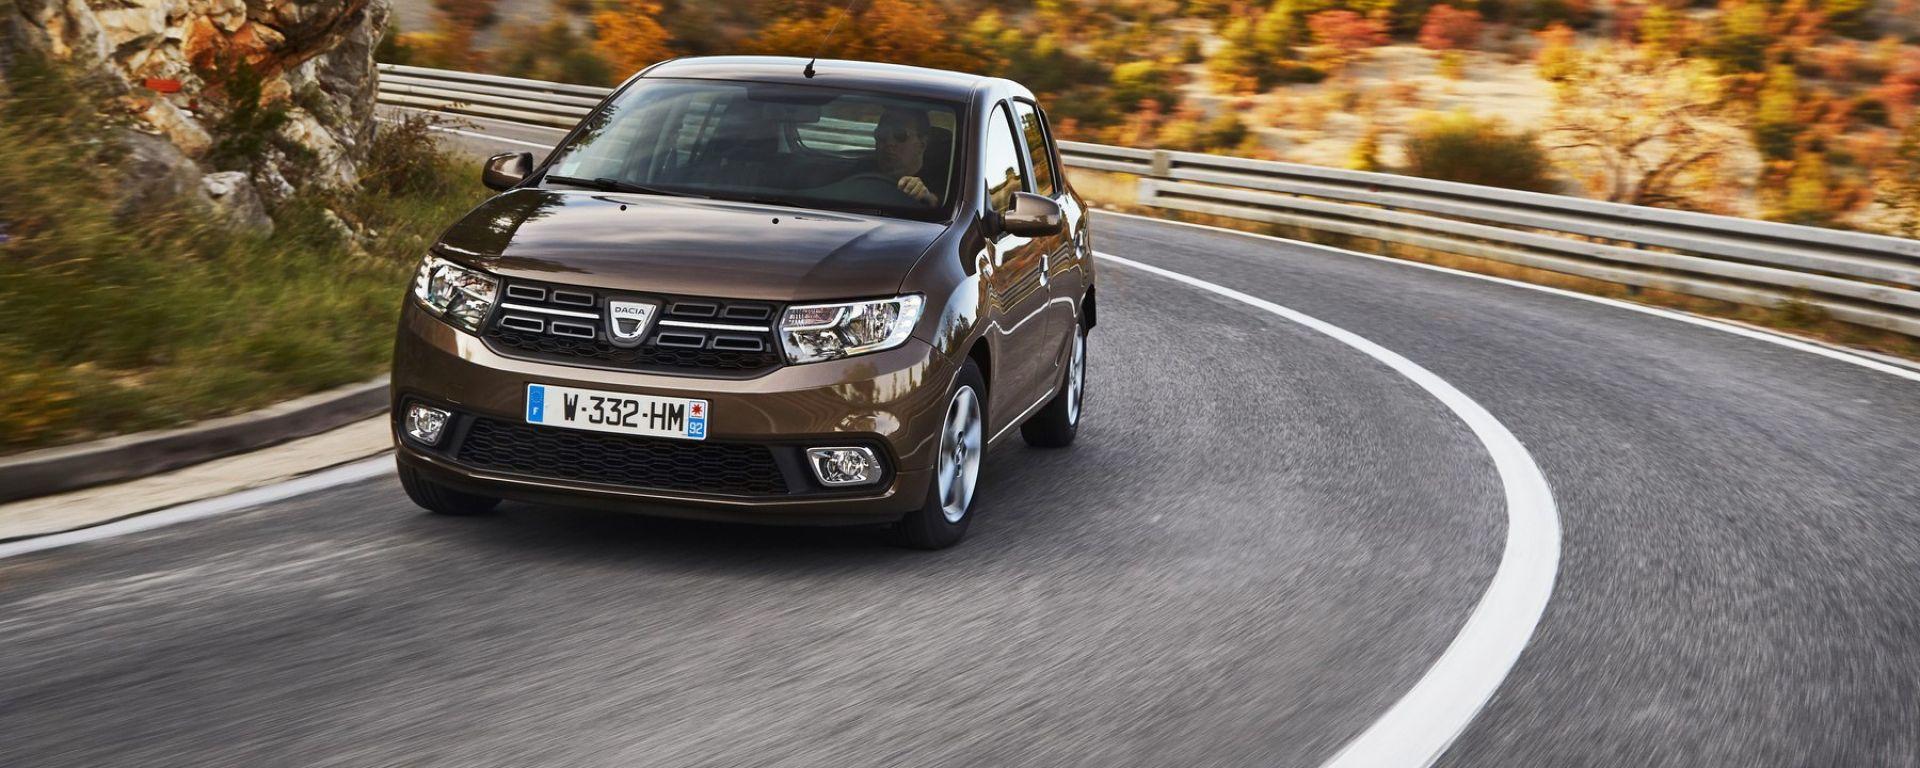 Dacia Sandero 1.0 SCe 75 CV: la prova su strada